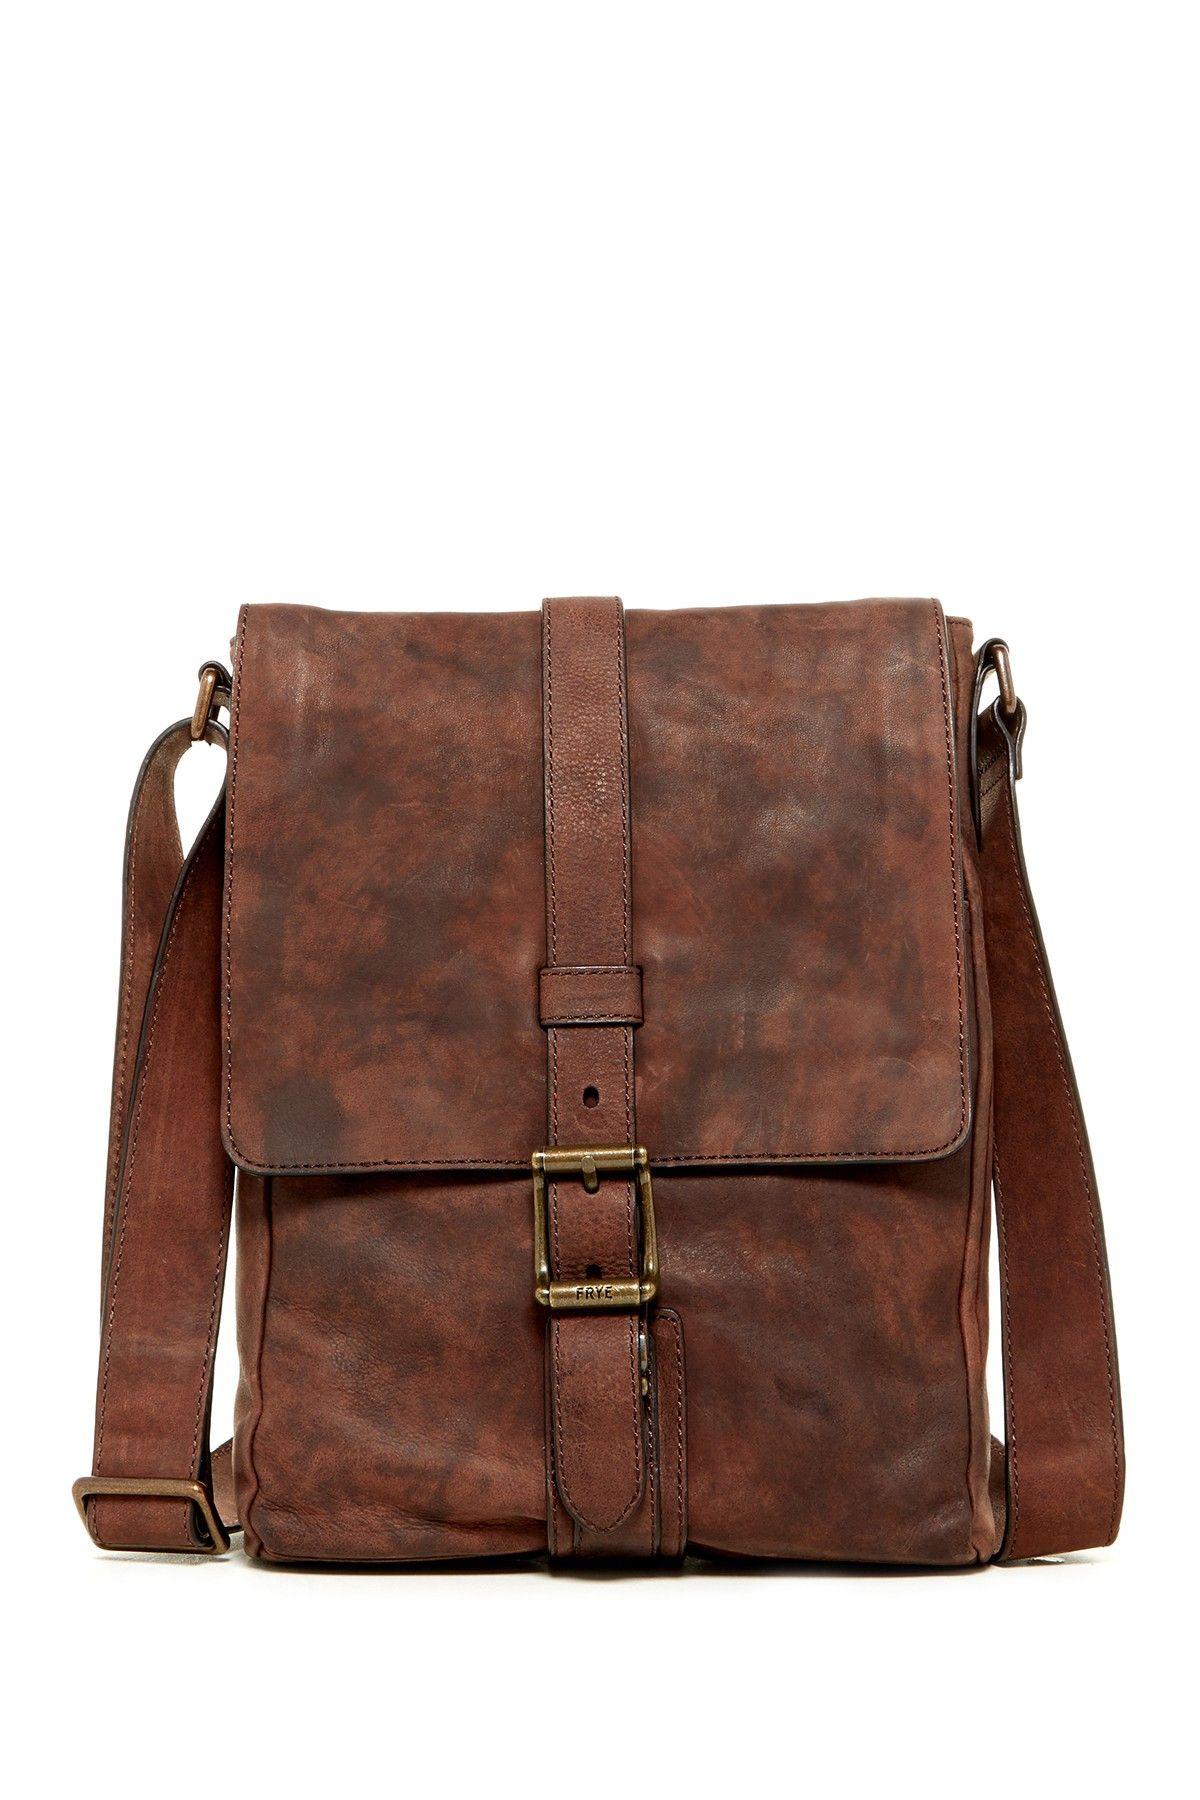 Frye Logan Small Leather Messenger Sponsored By Nordstrom Rack